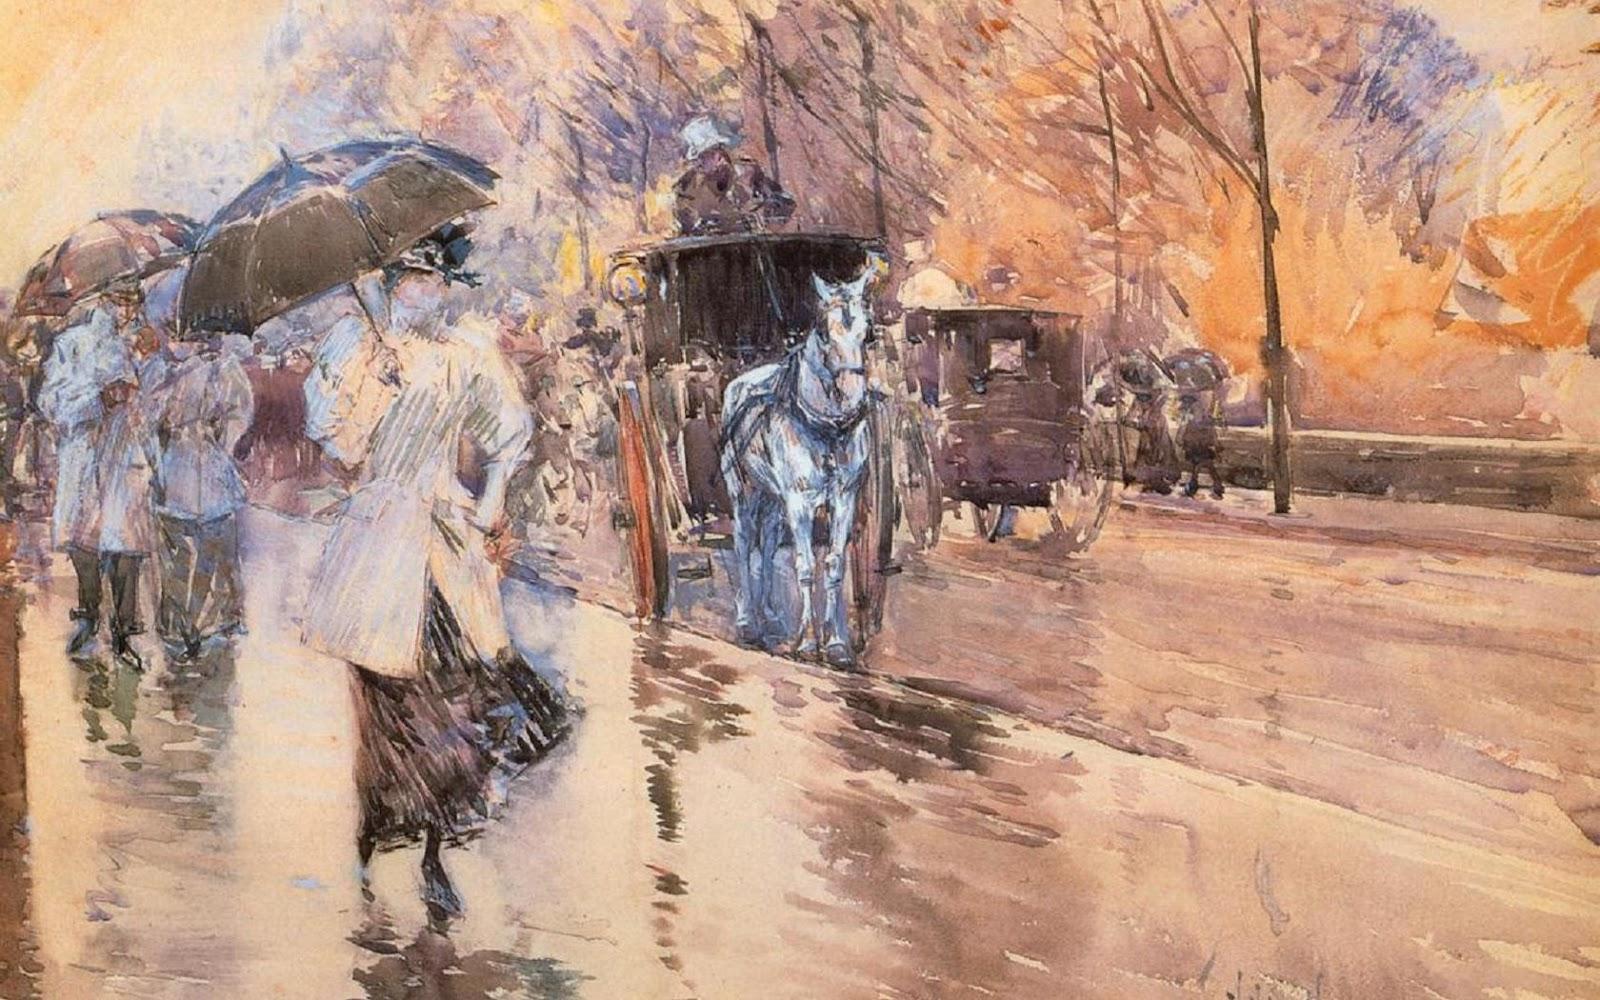 http://1.bp.blogspot.com/-dAImS2pFypc/T7pVFZe-4VI/AAAAAAAACKc/M3dF4Tg8ifs/s1600/frederick-childe-hassam-wallpaper-impressionism-rain-people-painting.jpg